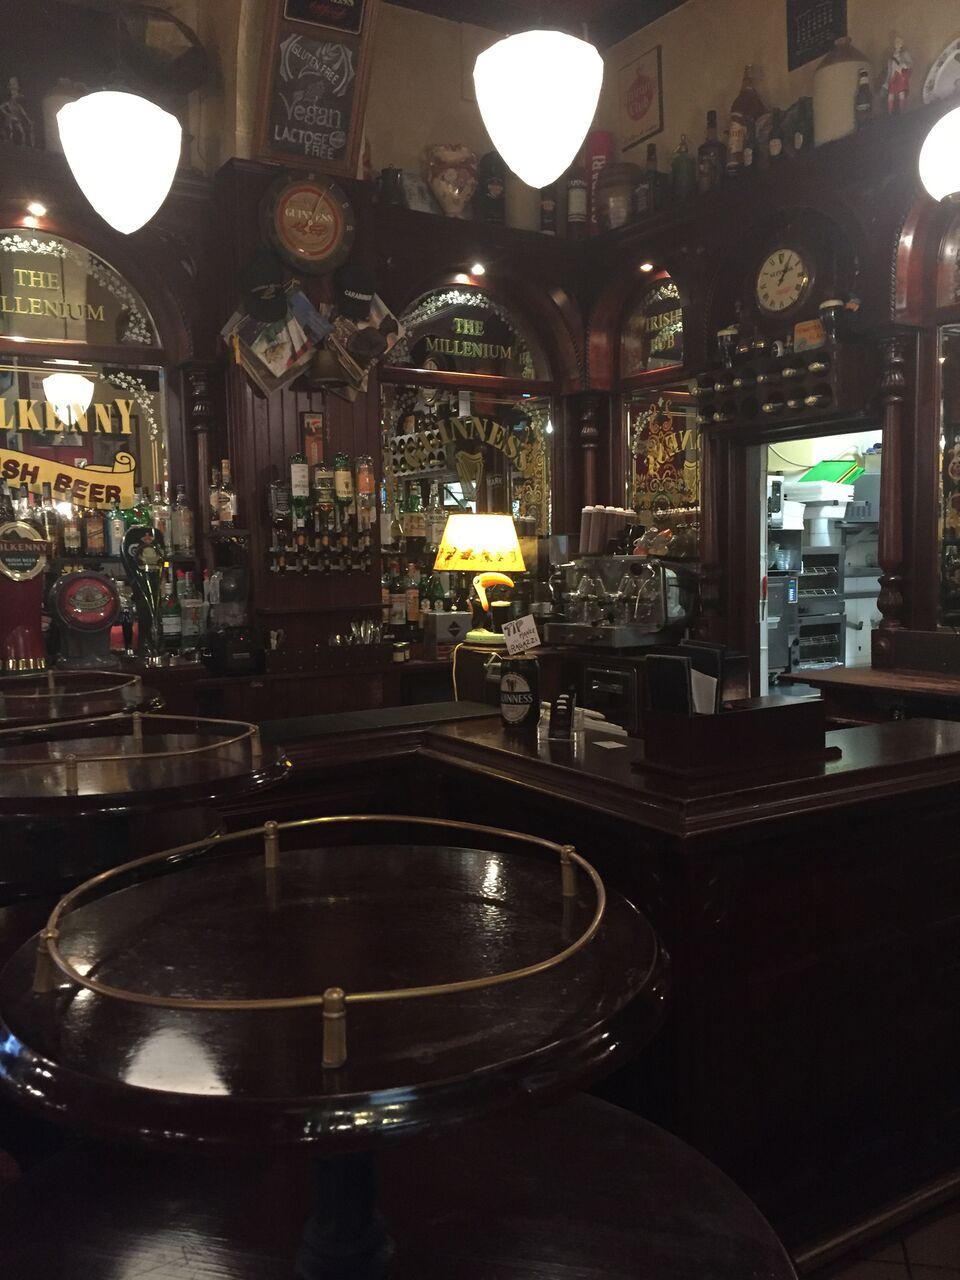 Victorian Irish Pub Design - Interior view of dark wooden furnishings and soft lighting.